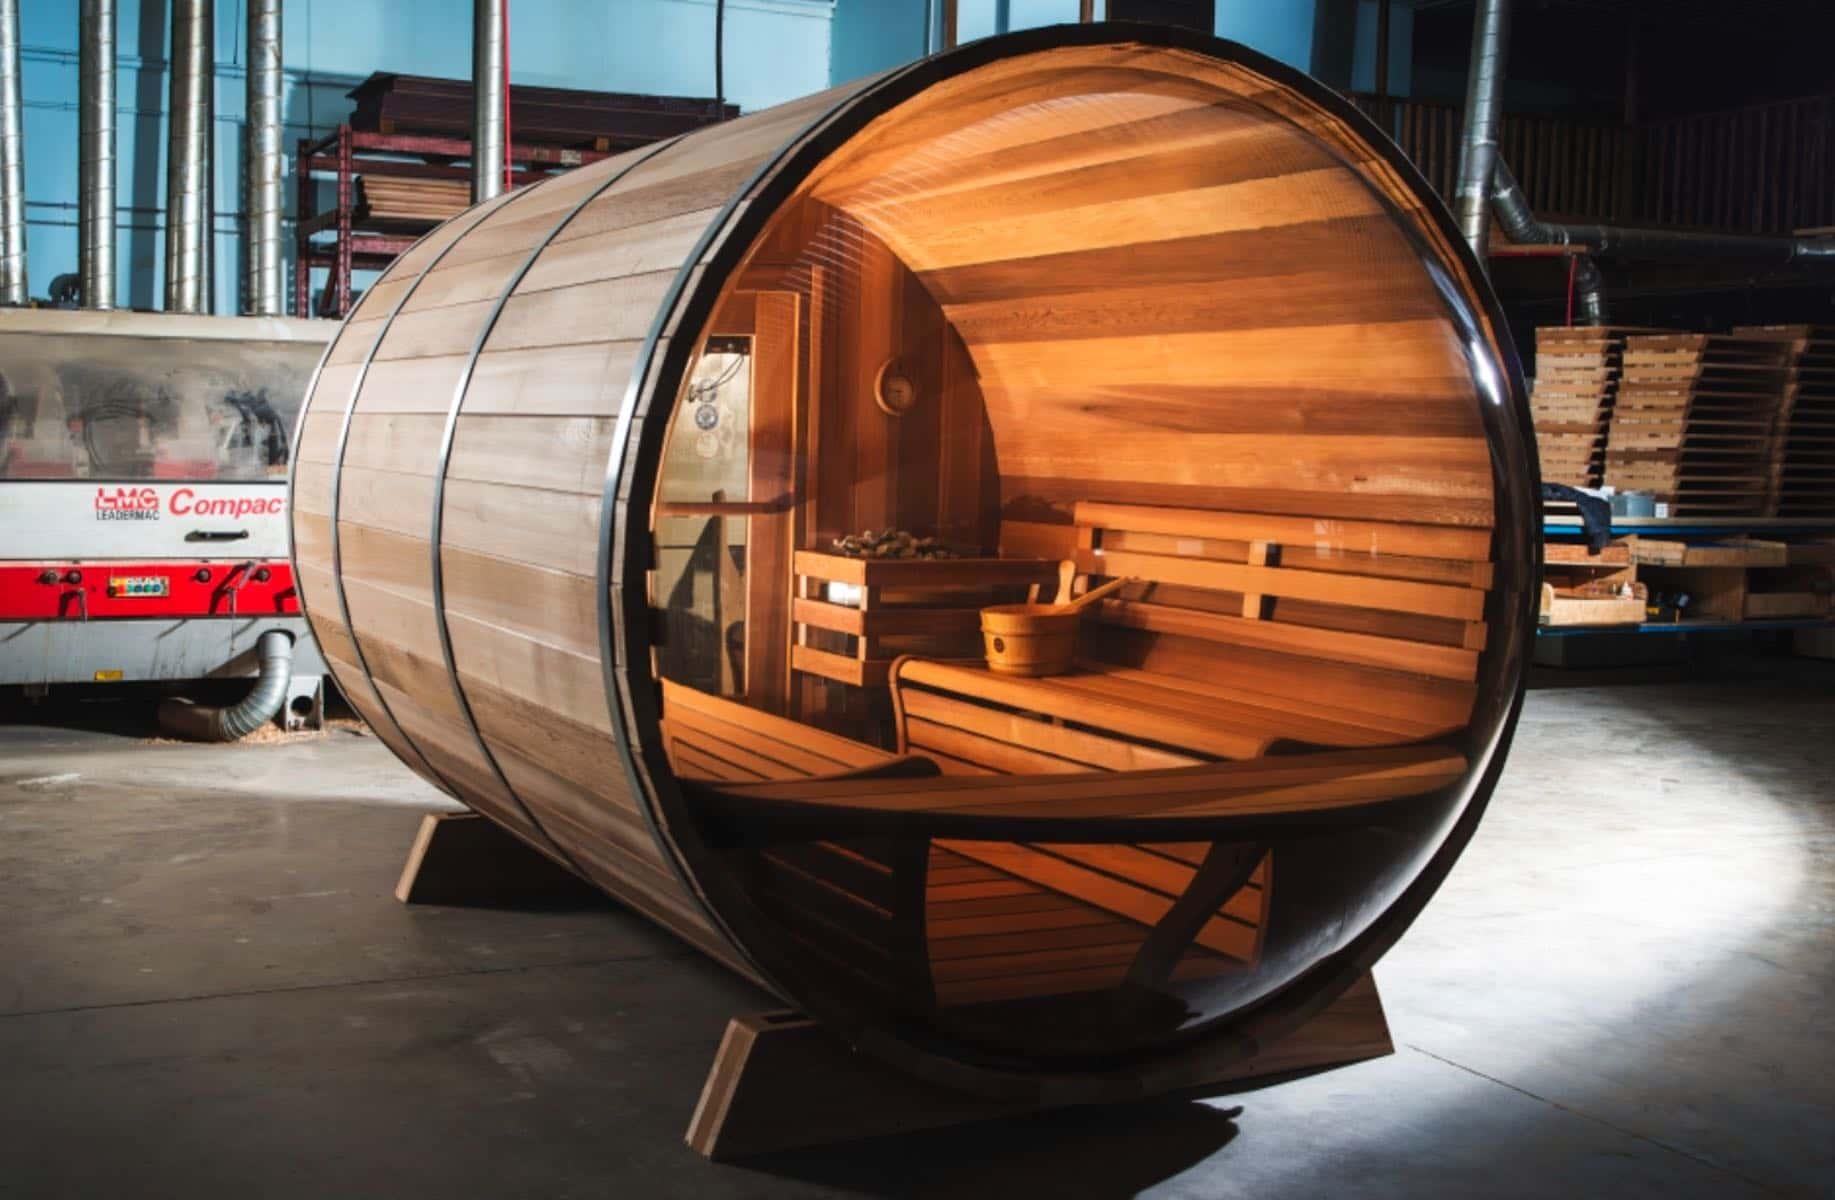 Leisure Craft West – Panoramic View Barrel Sauna